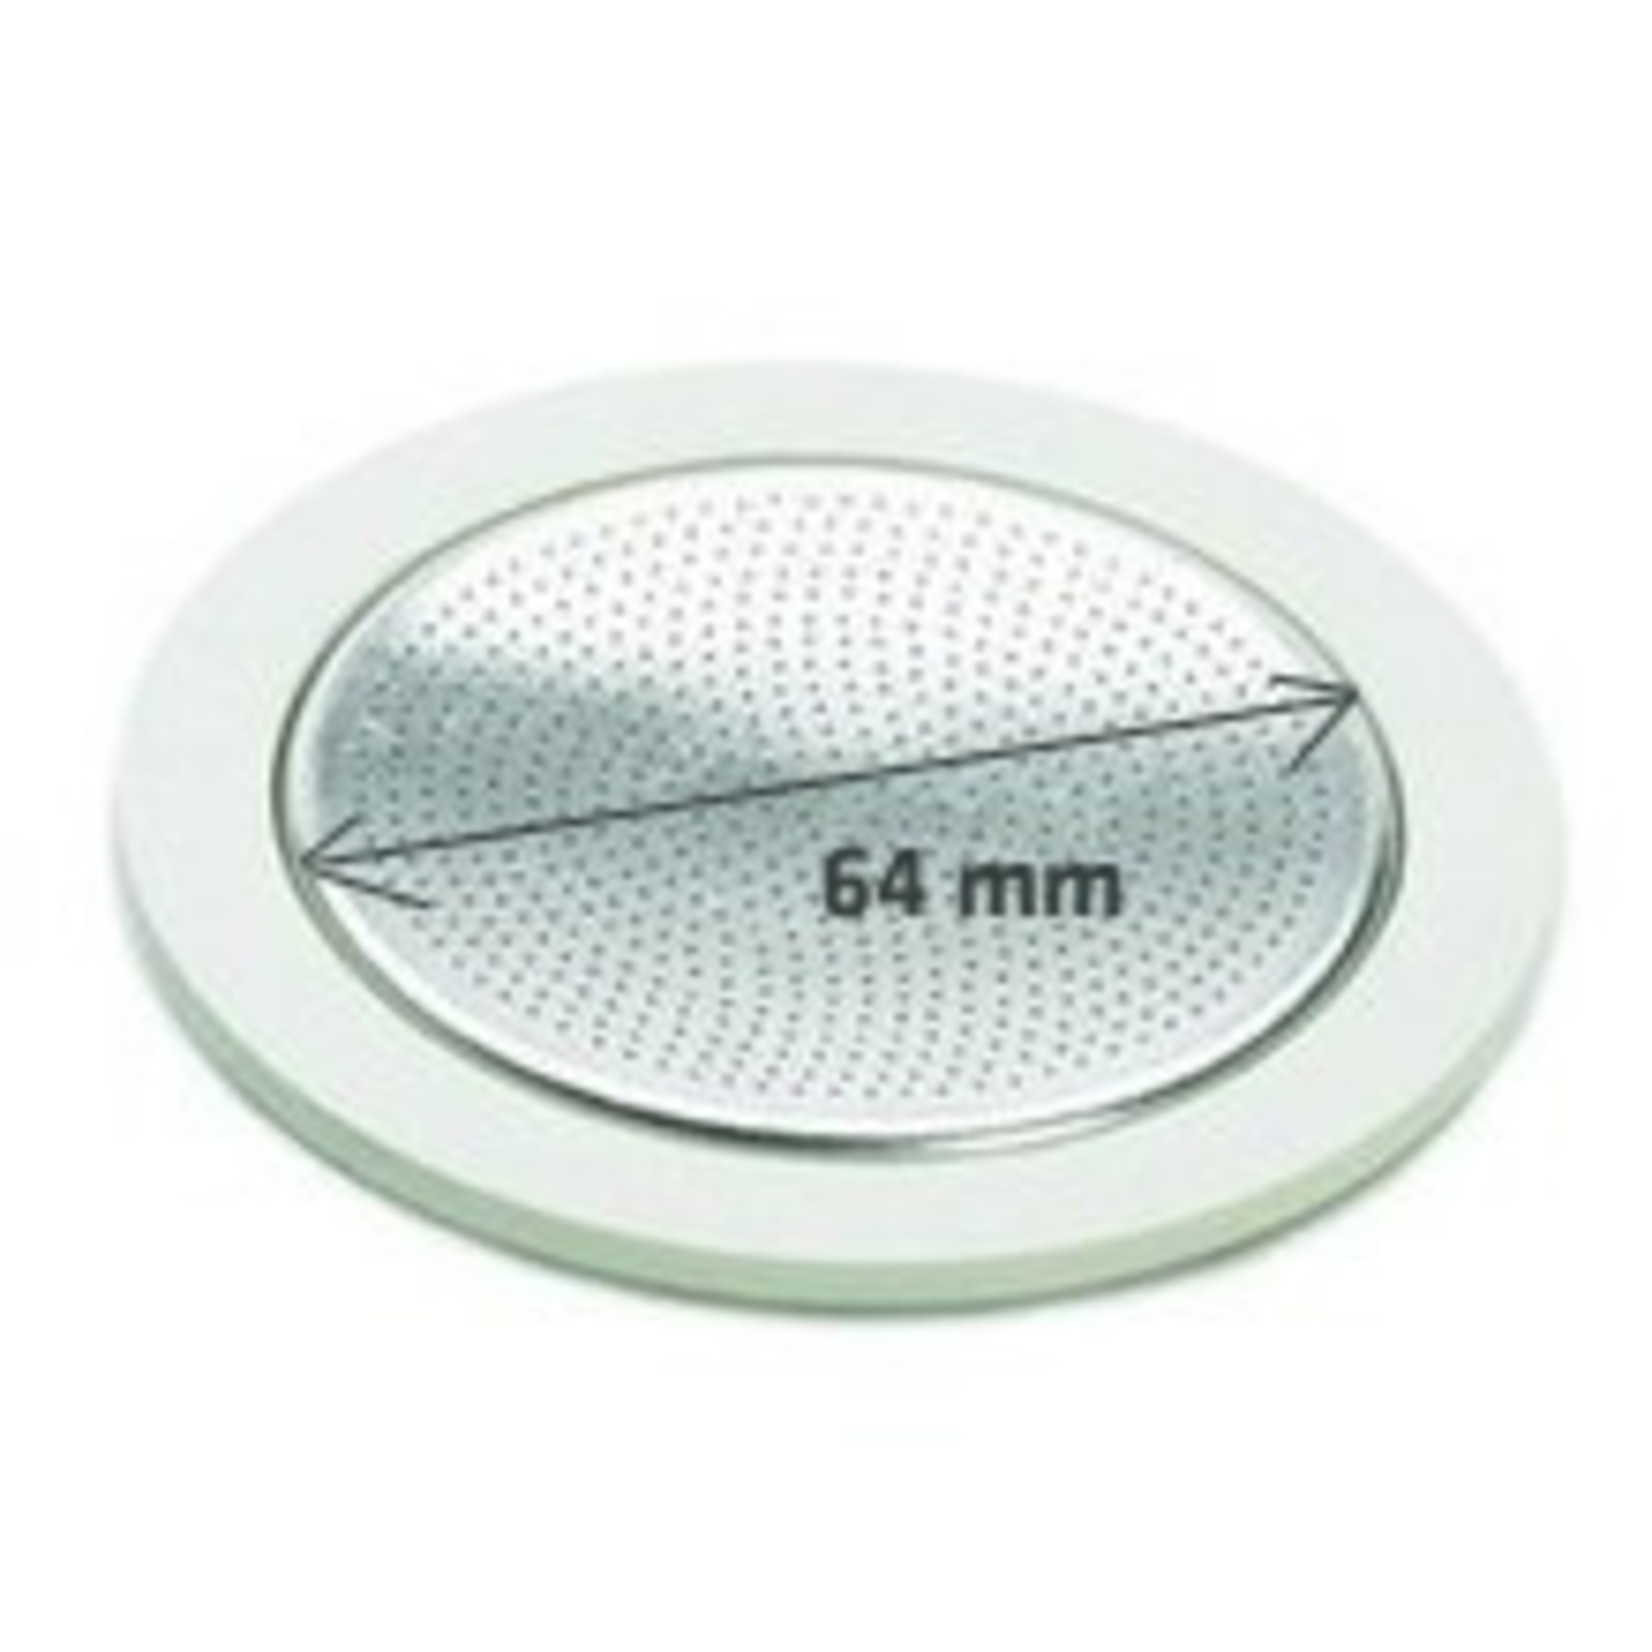 Bialetti Bialetti filterplaatje met rubberen ringen 9 kops aluminium